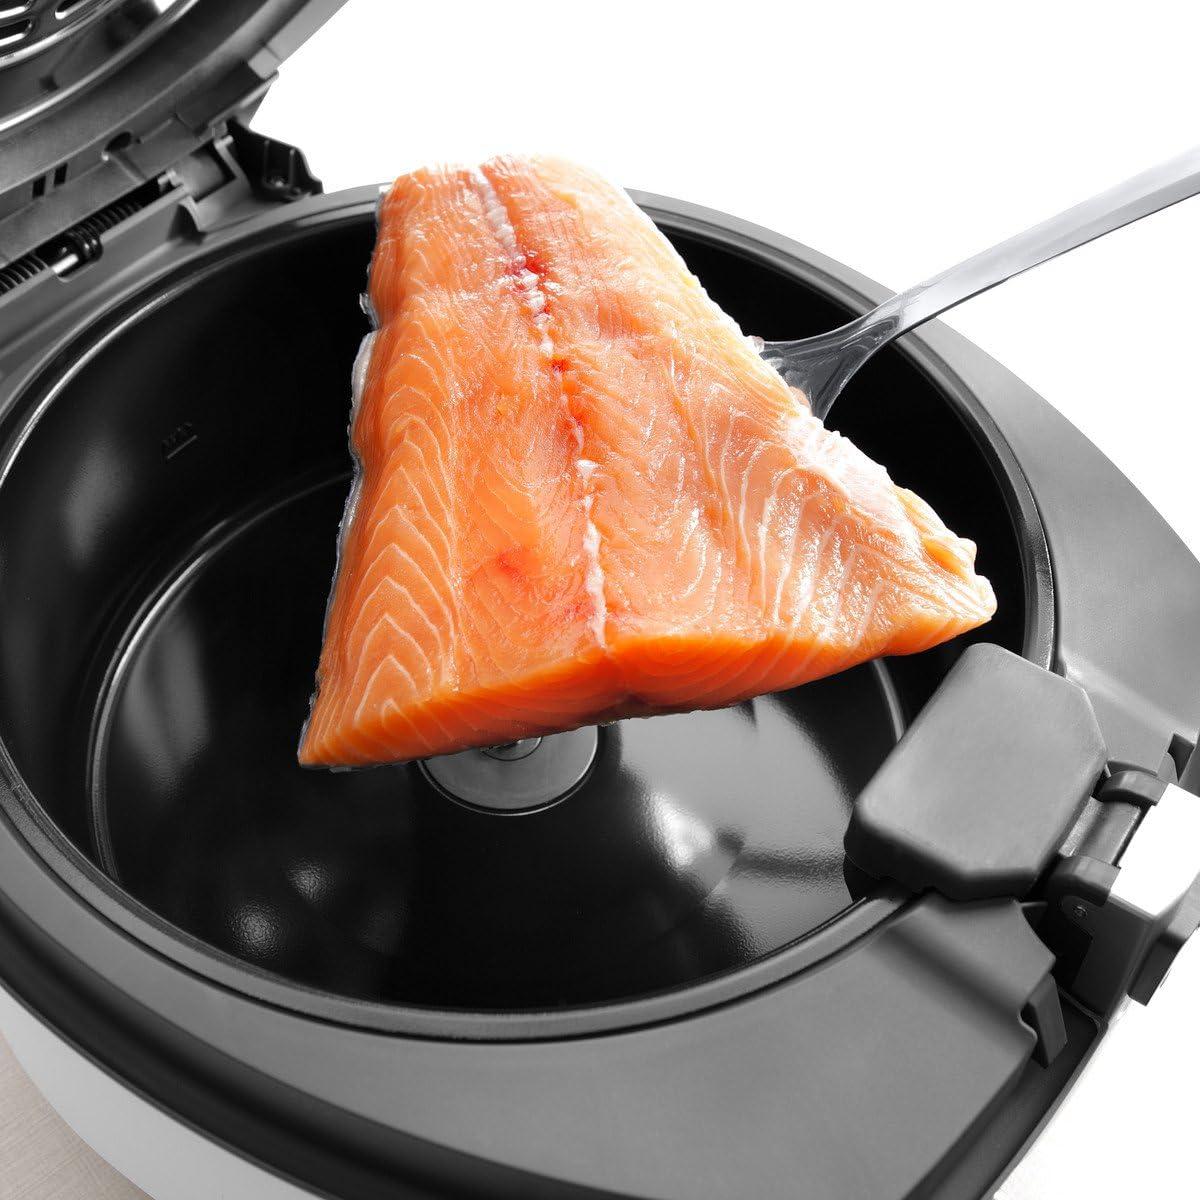 Best air fryer with rotisserie - De'Longhi